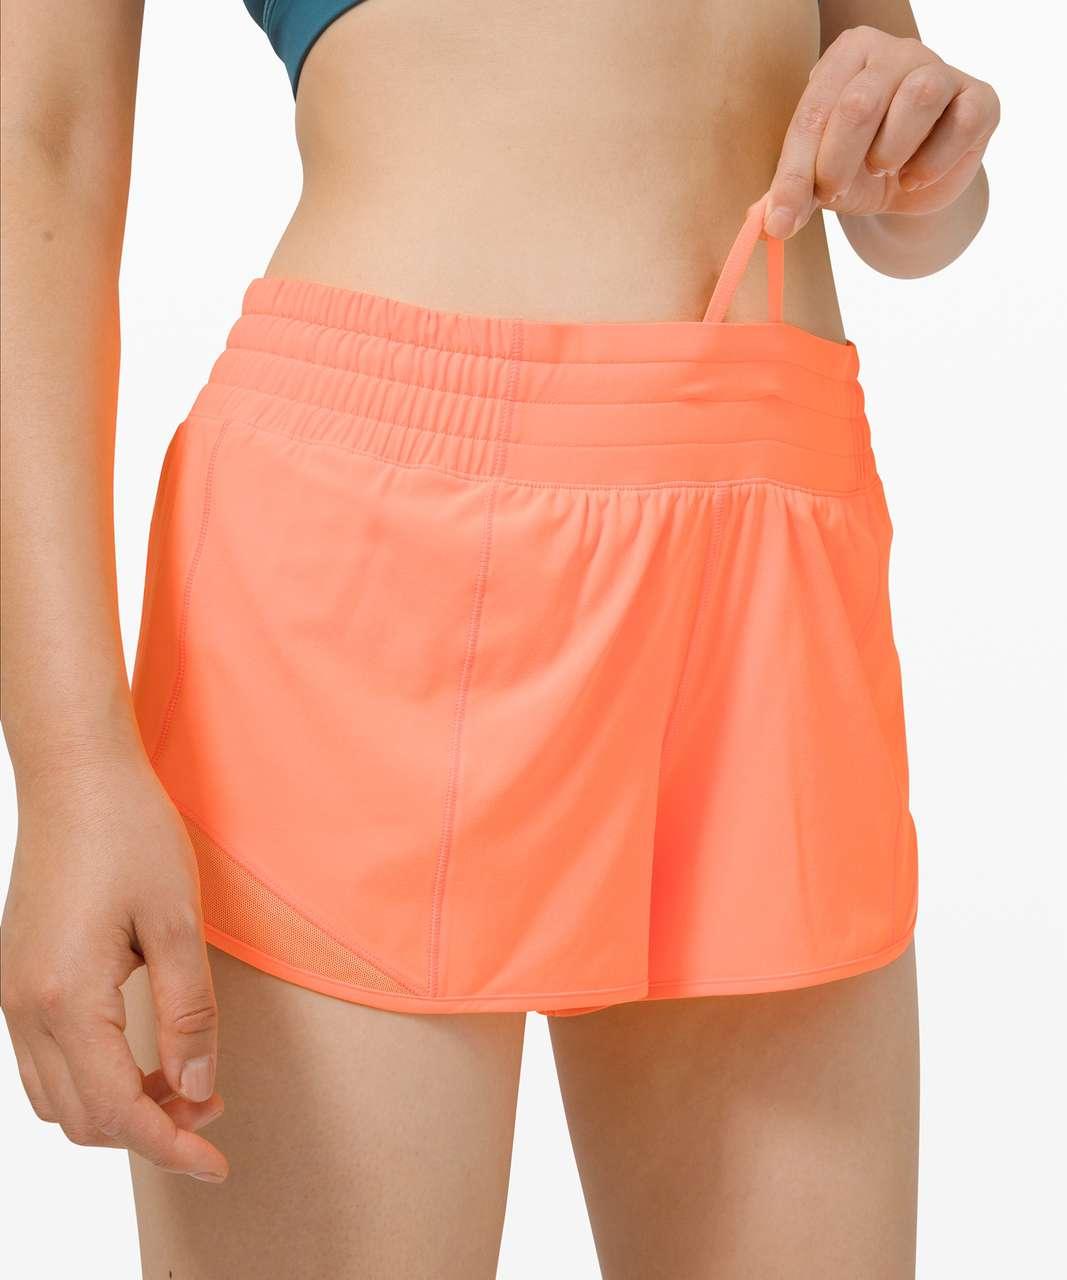 "Lululemon Hotty Hot Short *High-Rise 2.5"" - Highlight Orange"